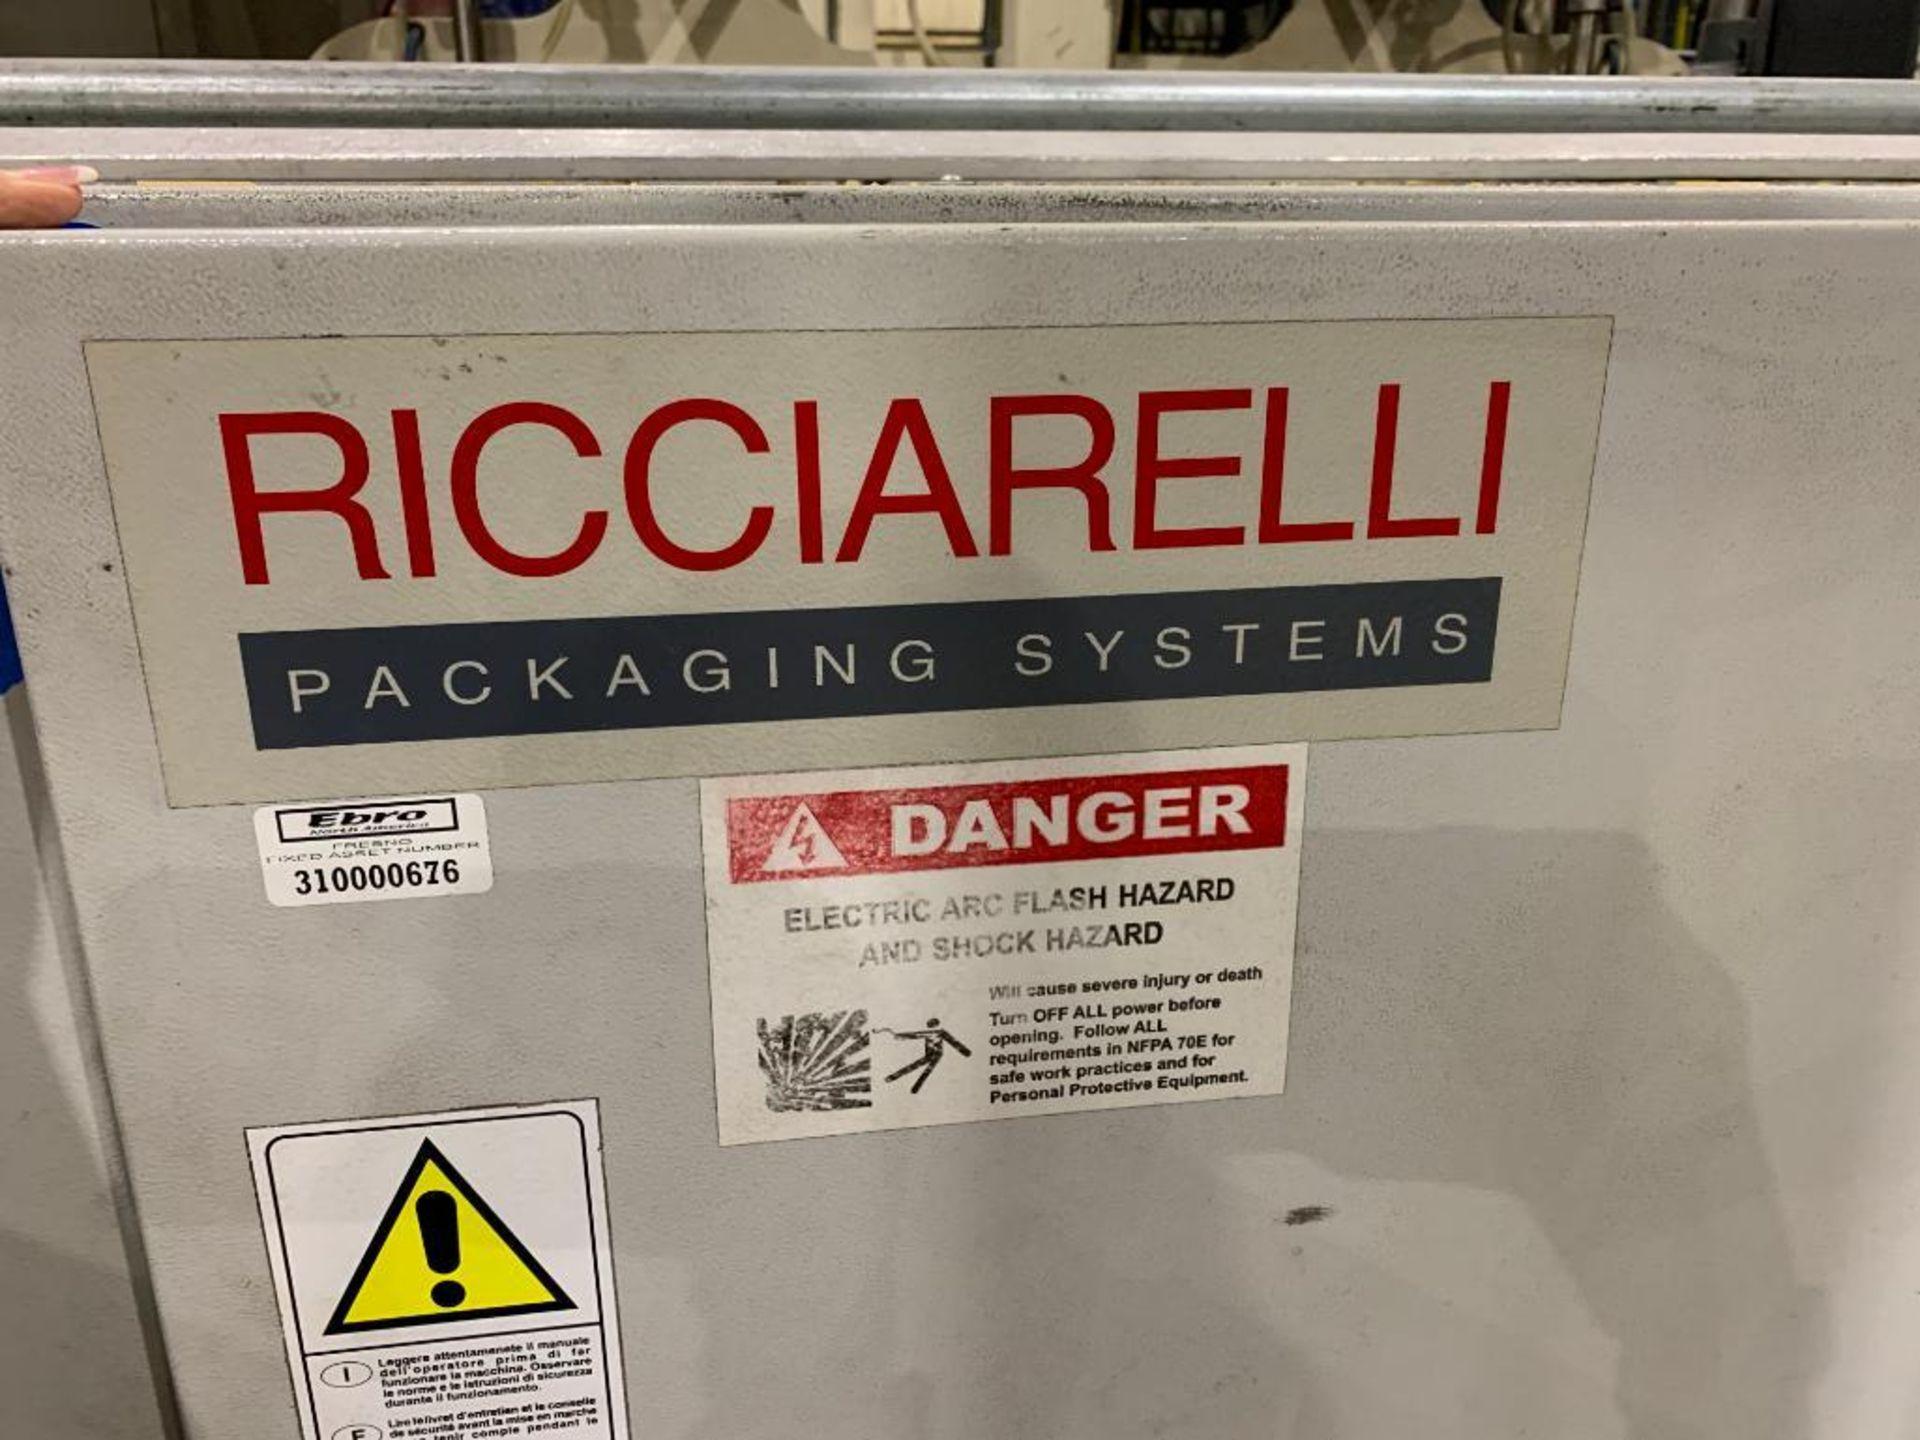 2010 Ricciarelli long goods horizontal flow wrapper - Image 49 of 79